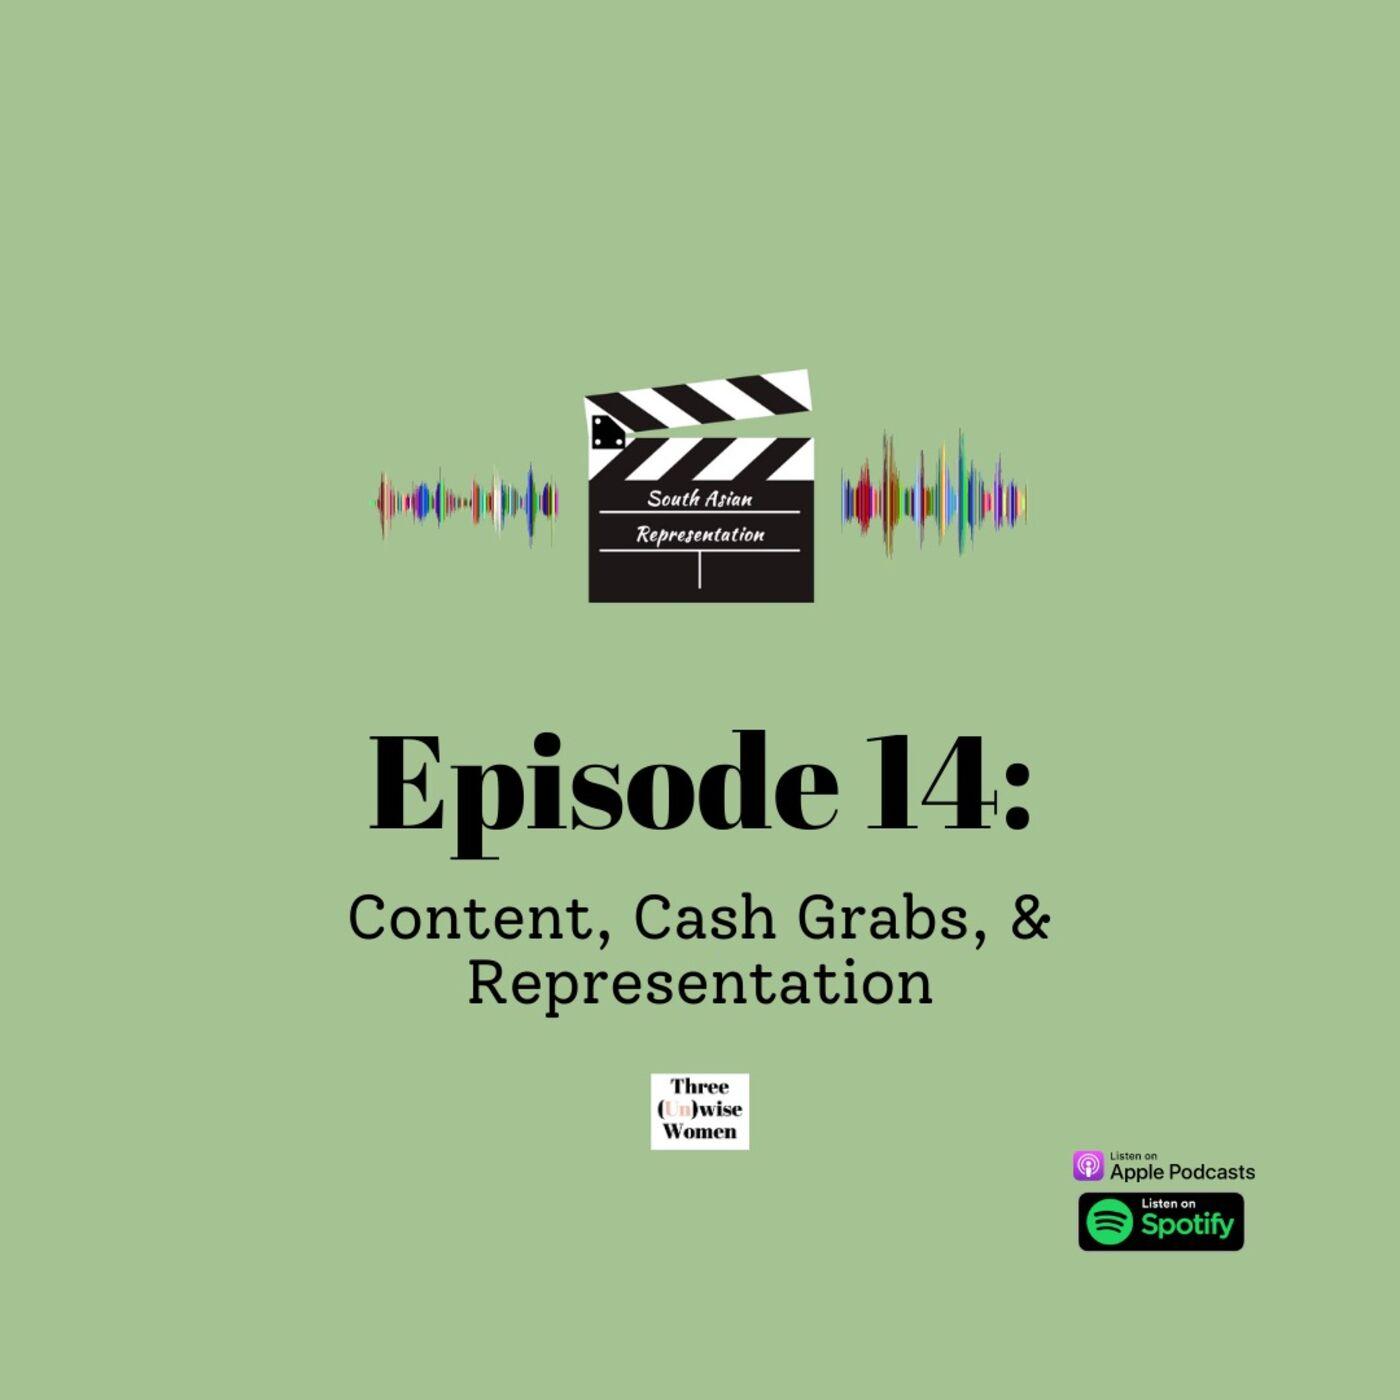 Content, Cash Grabs, and Representation